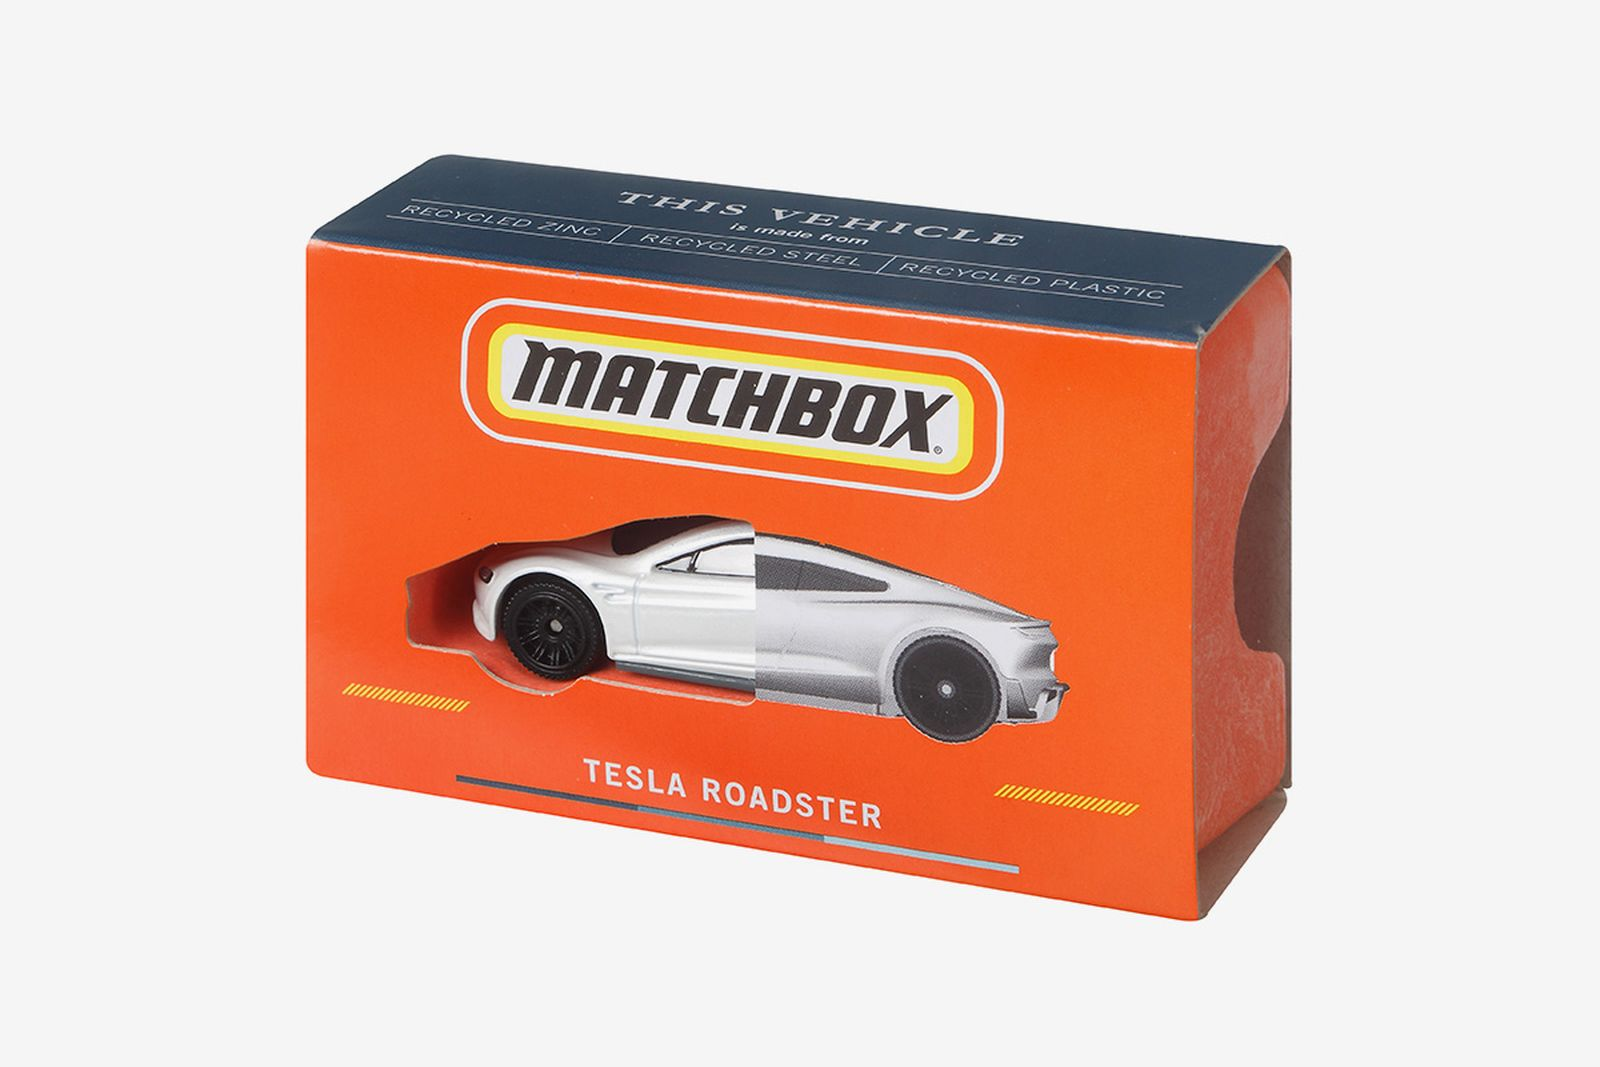 mattel-matchbox-tesla-roadster-01